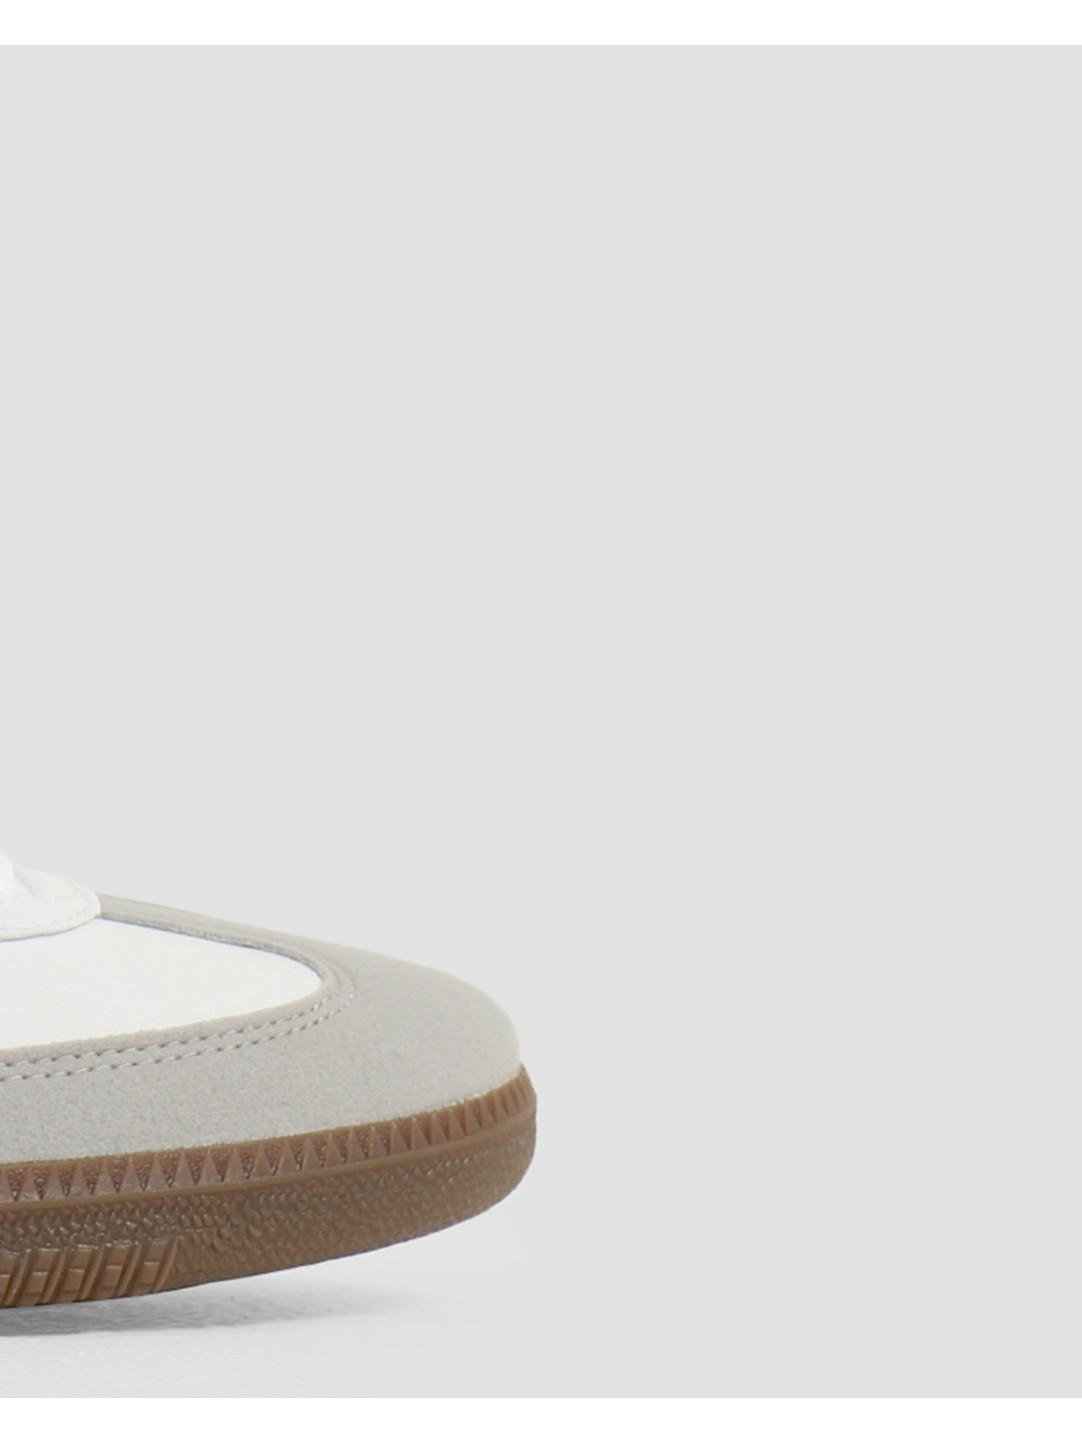 adidas adidas Samba Vegan Footwear White Cblack Gum5 FW2427